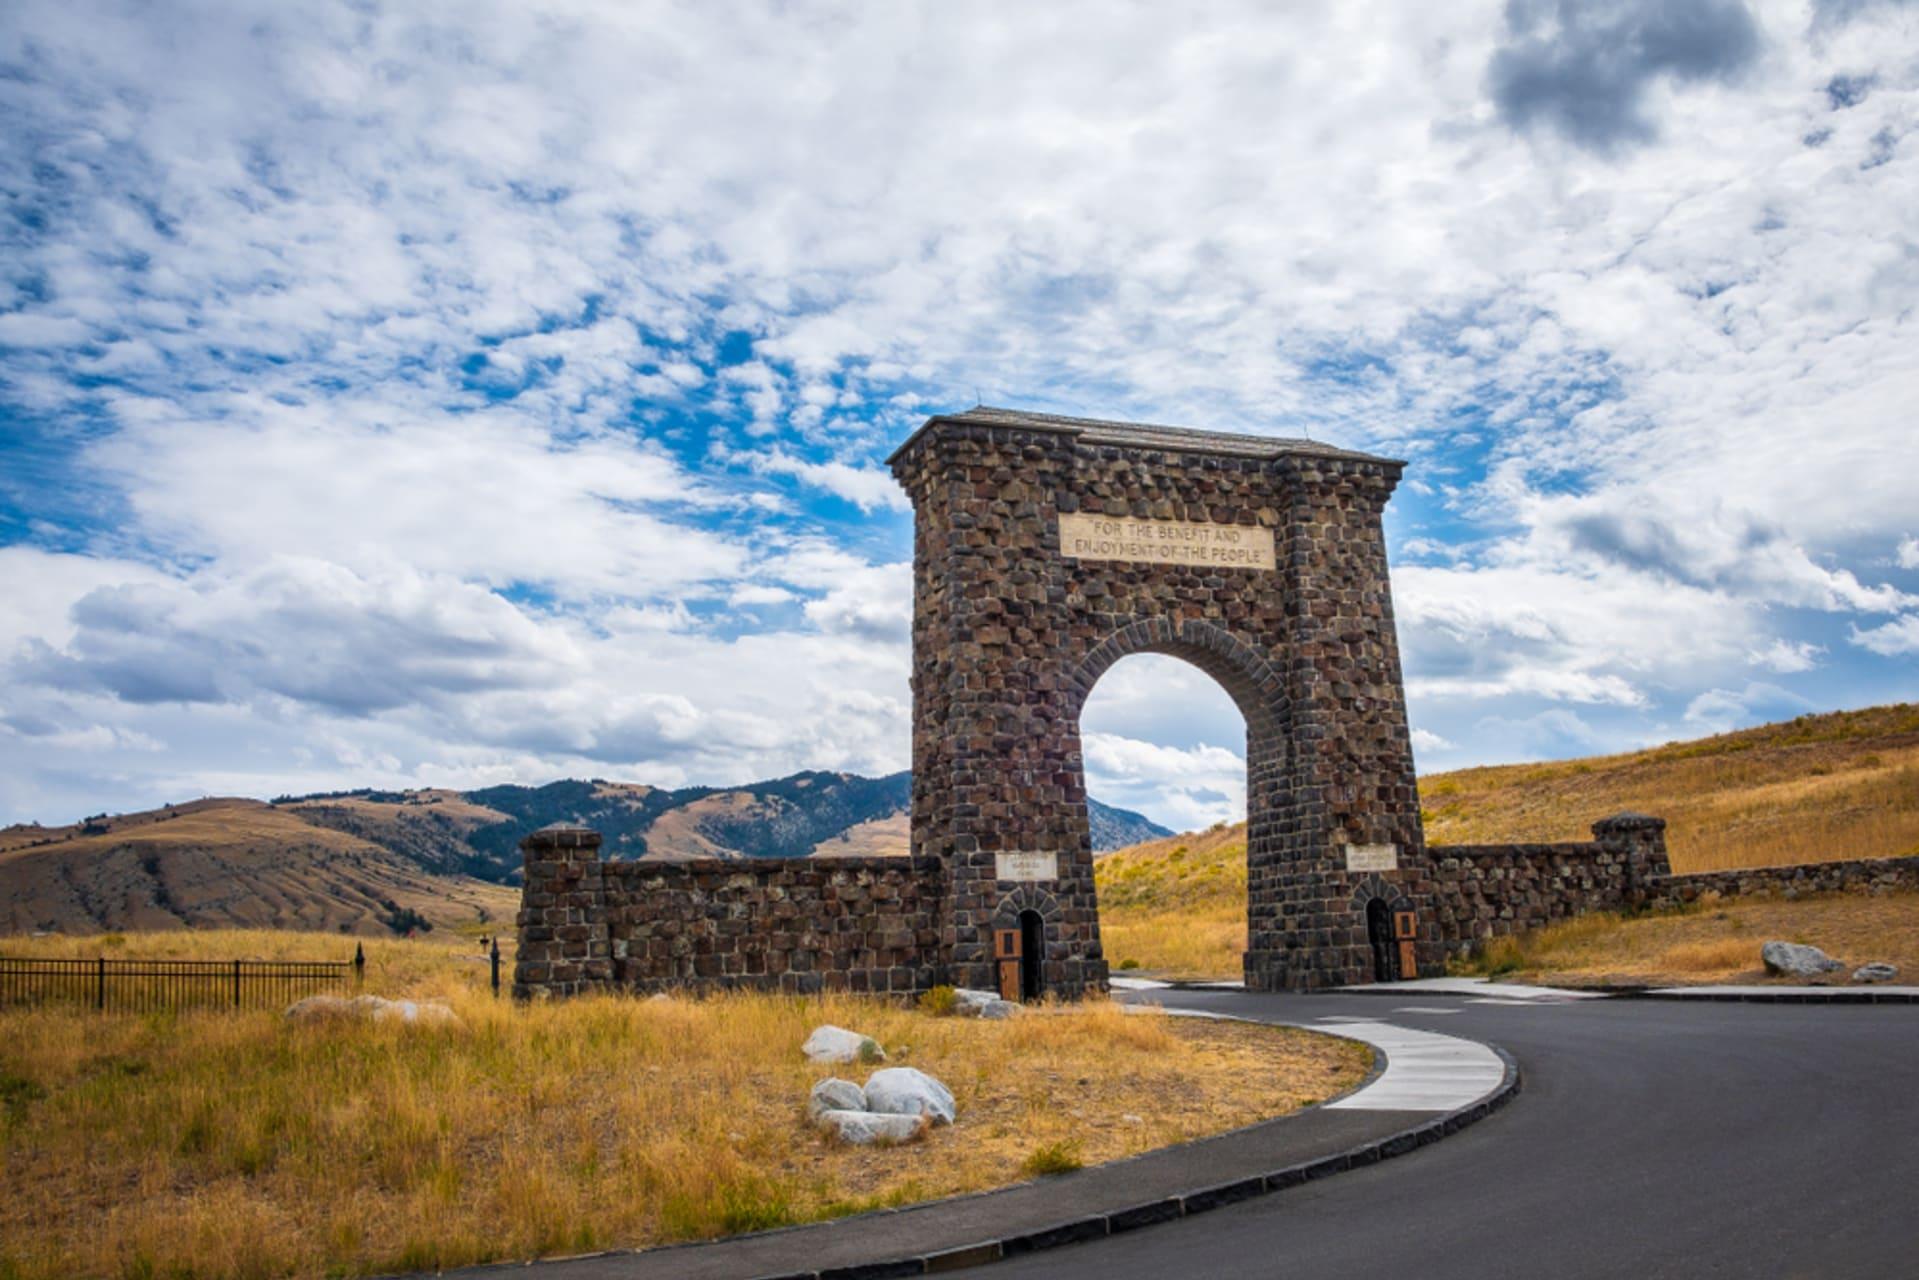 Yellowstone - The Roosevelt Arch, Yellowstone's Original Gateway